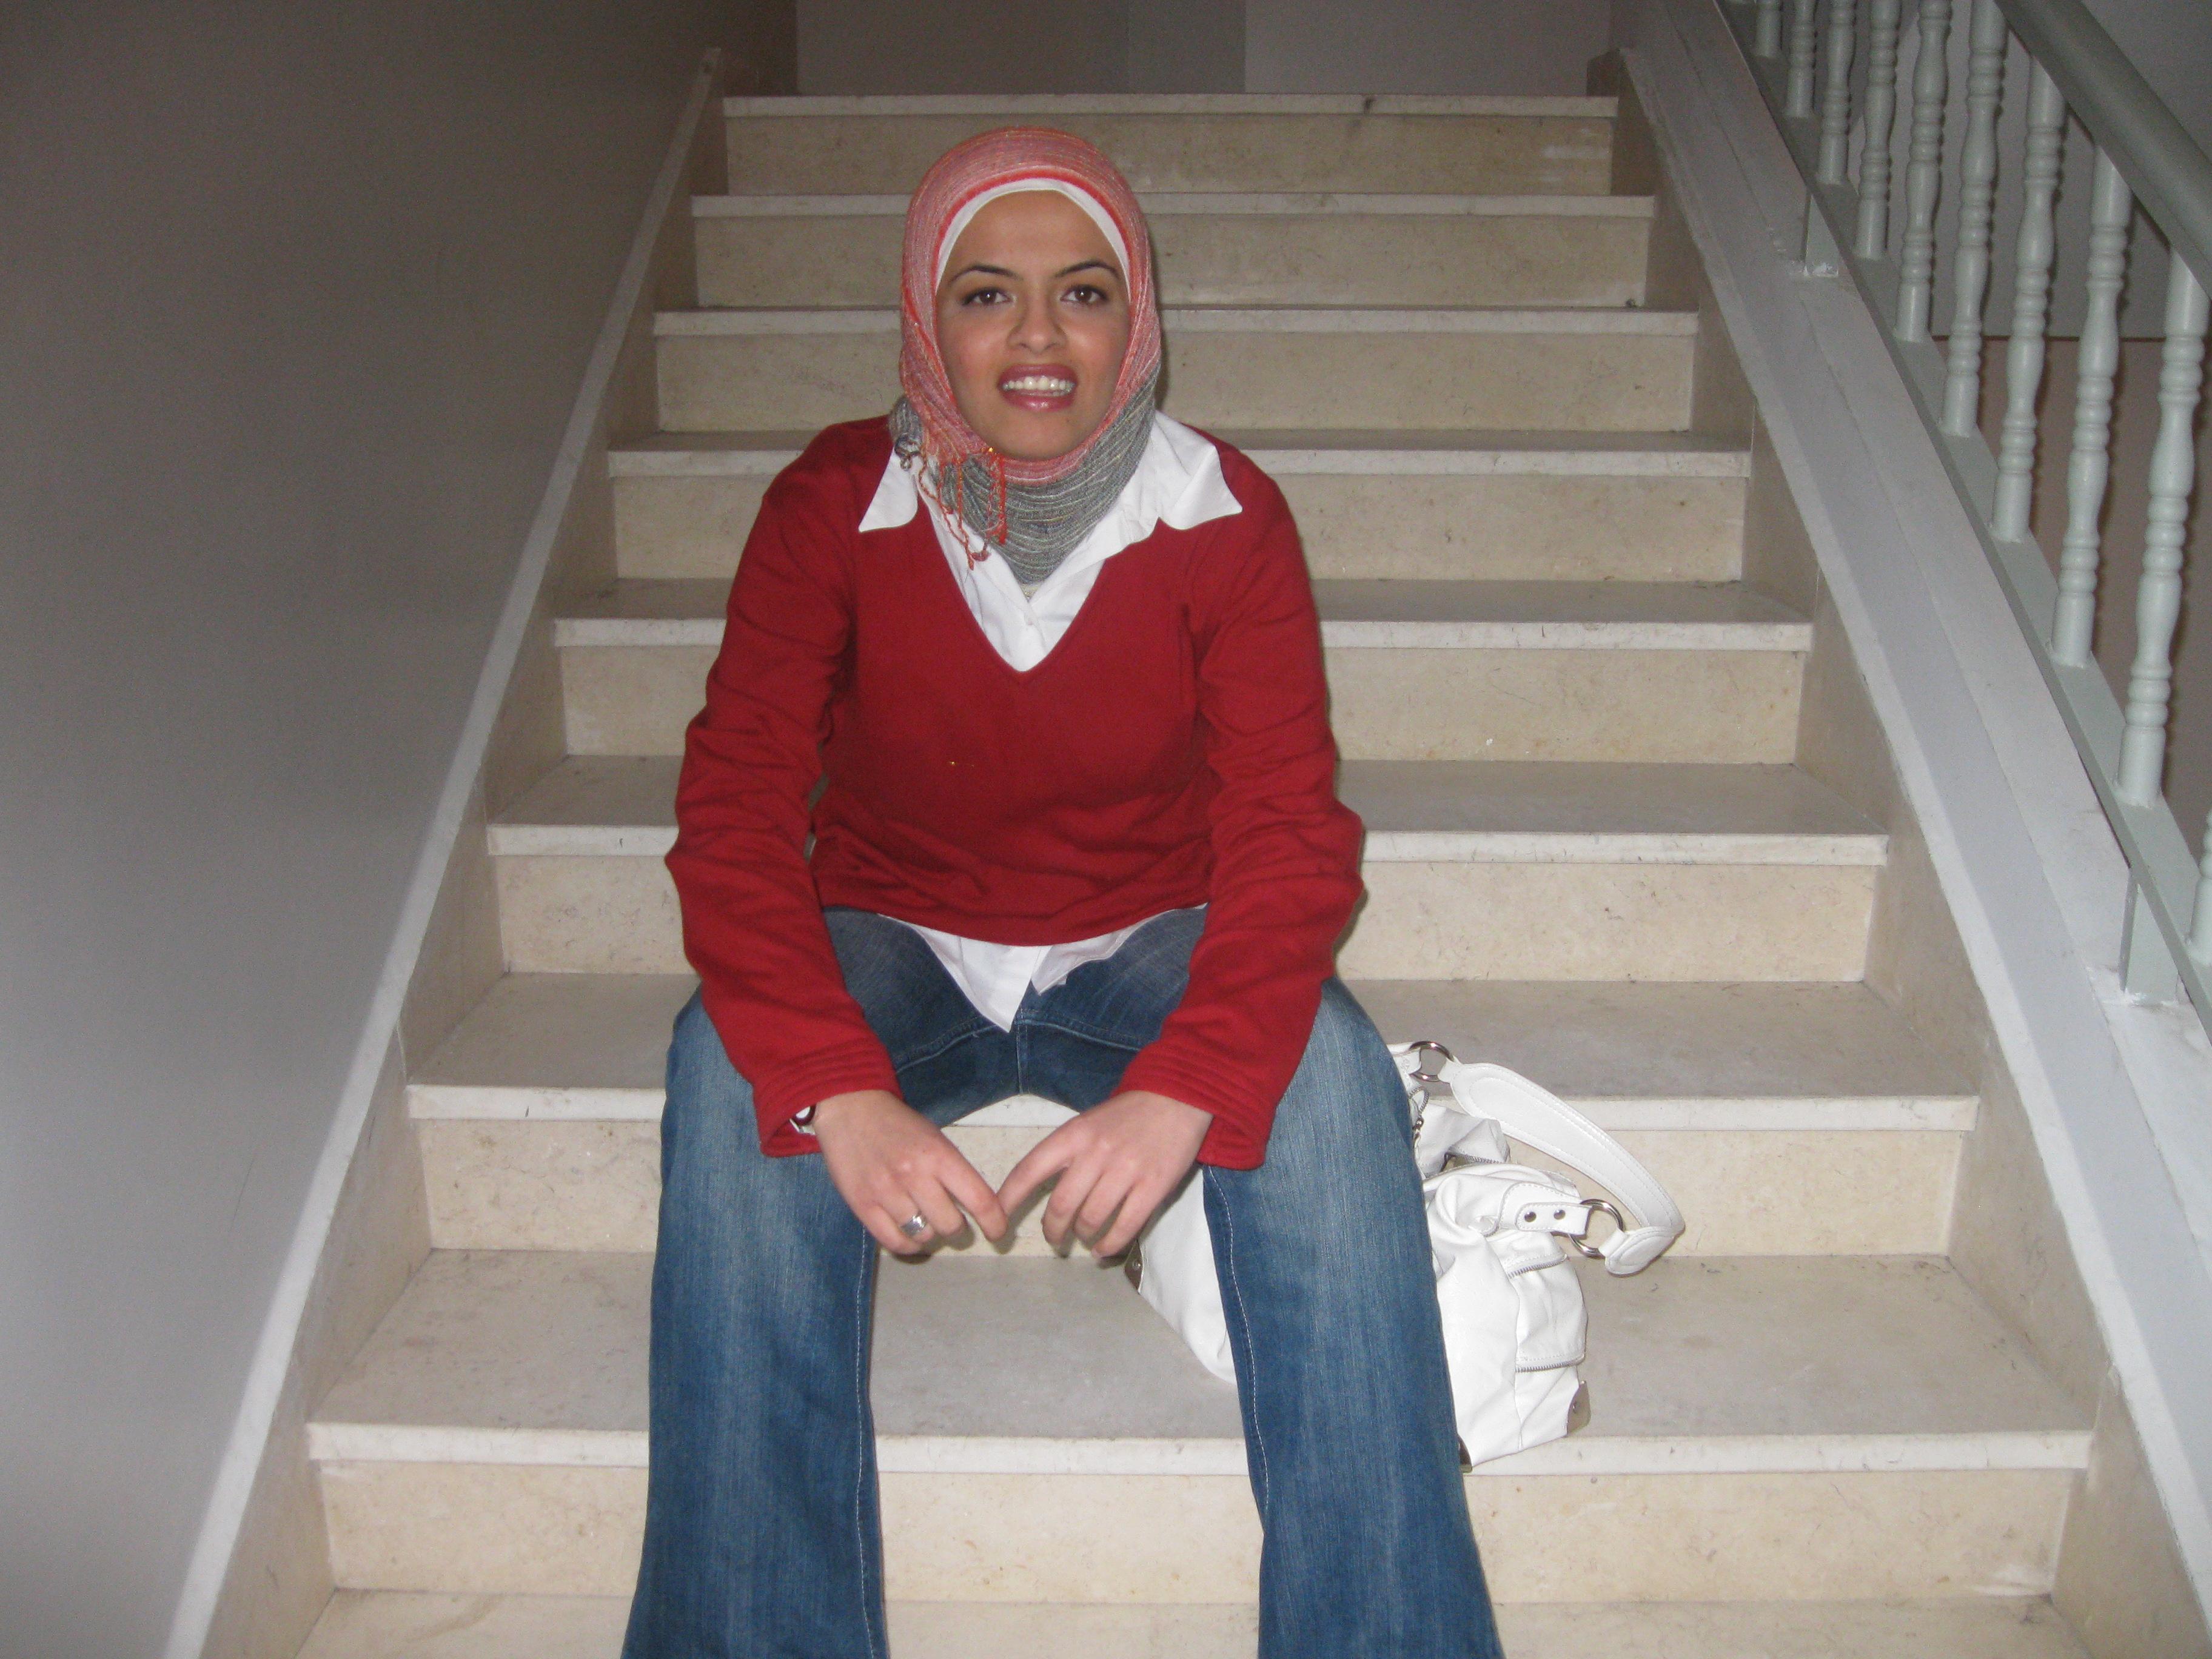 Zain Abu Qasem